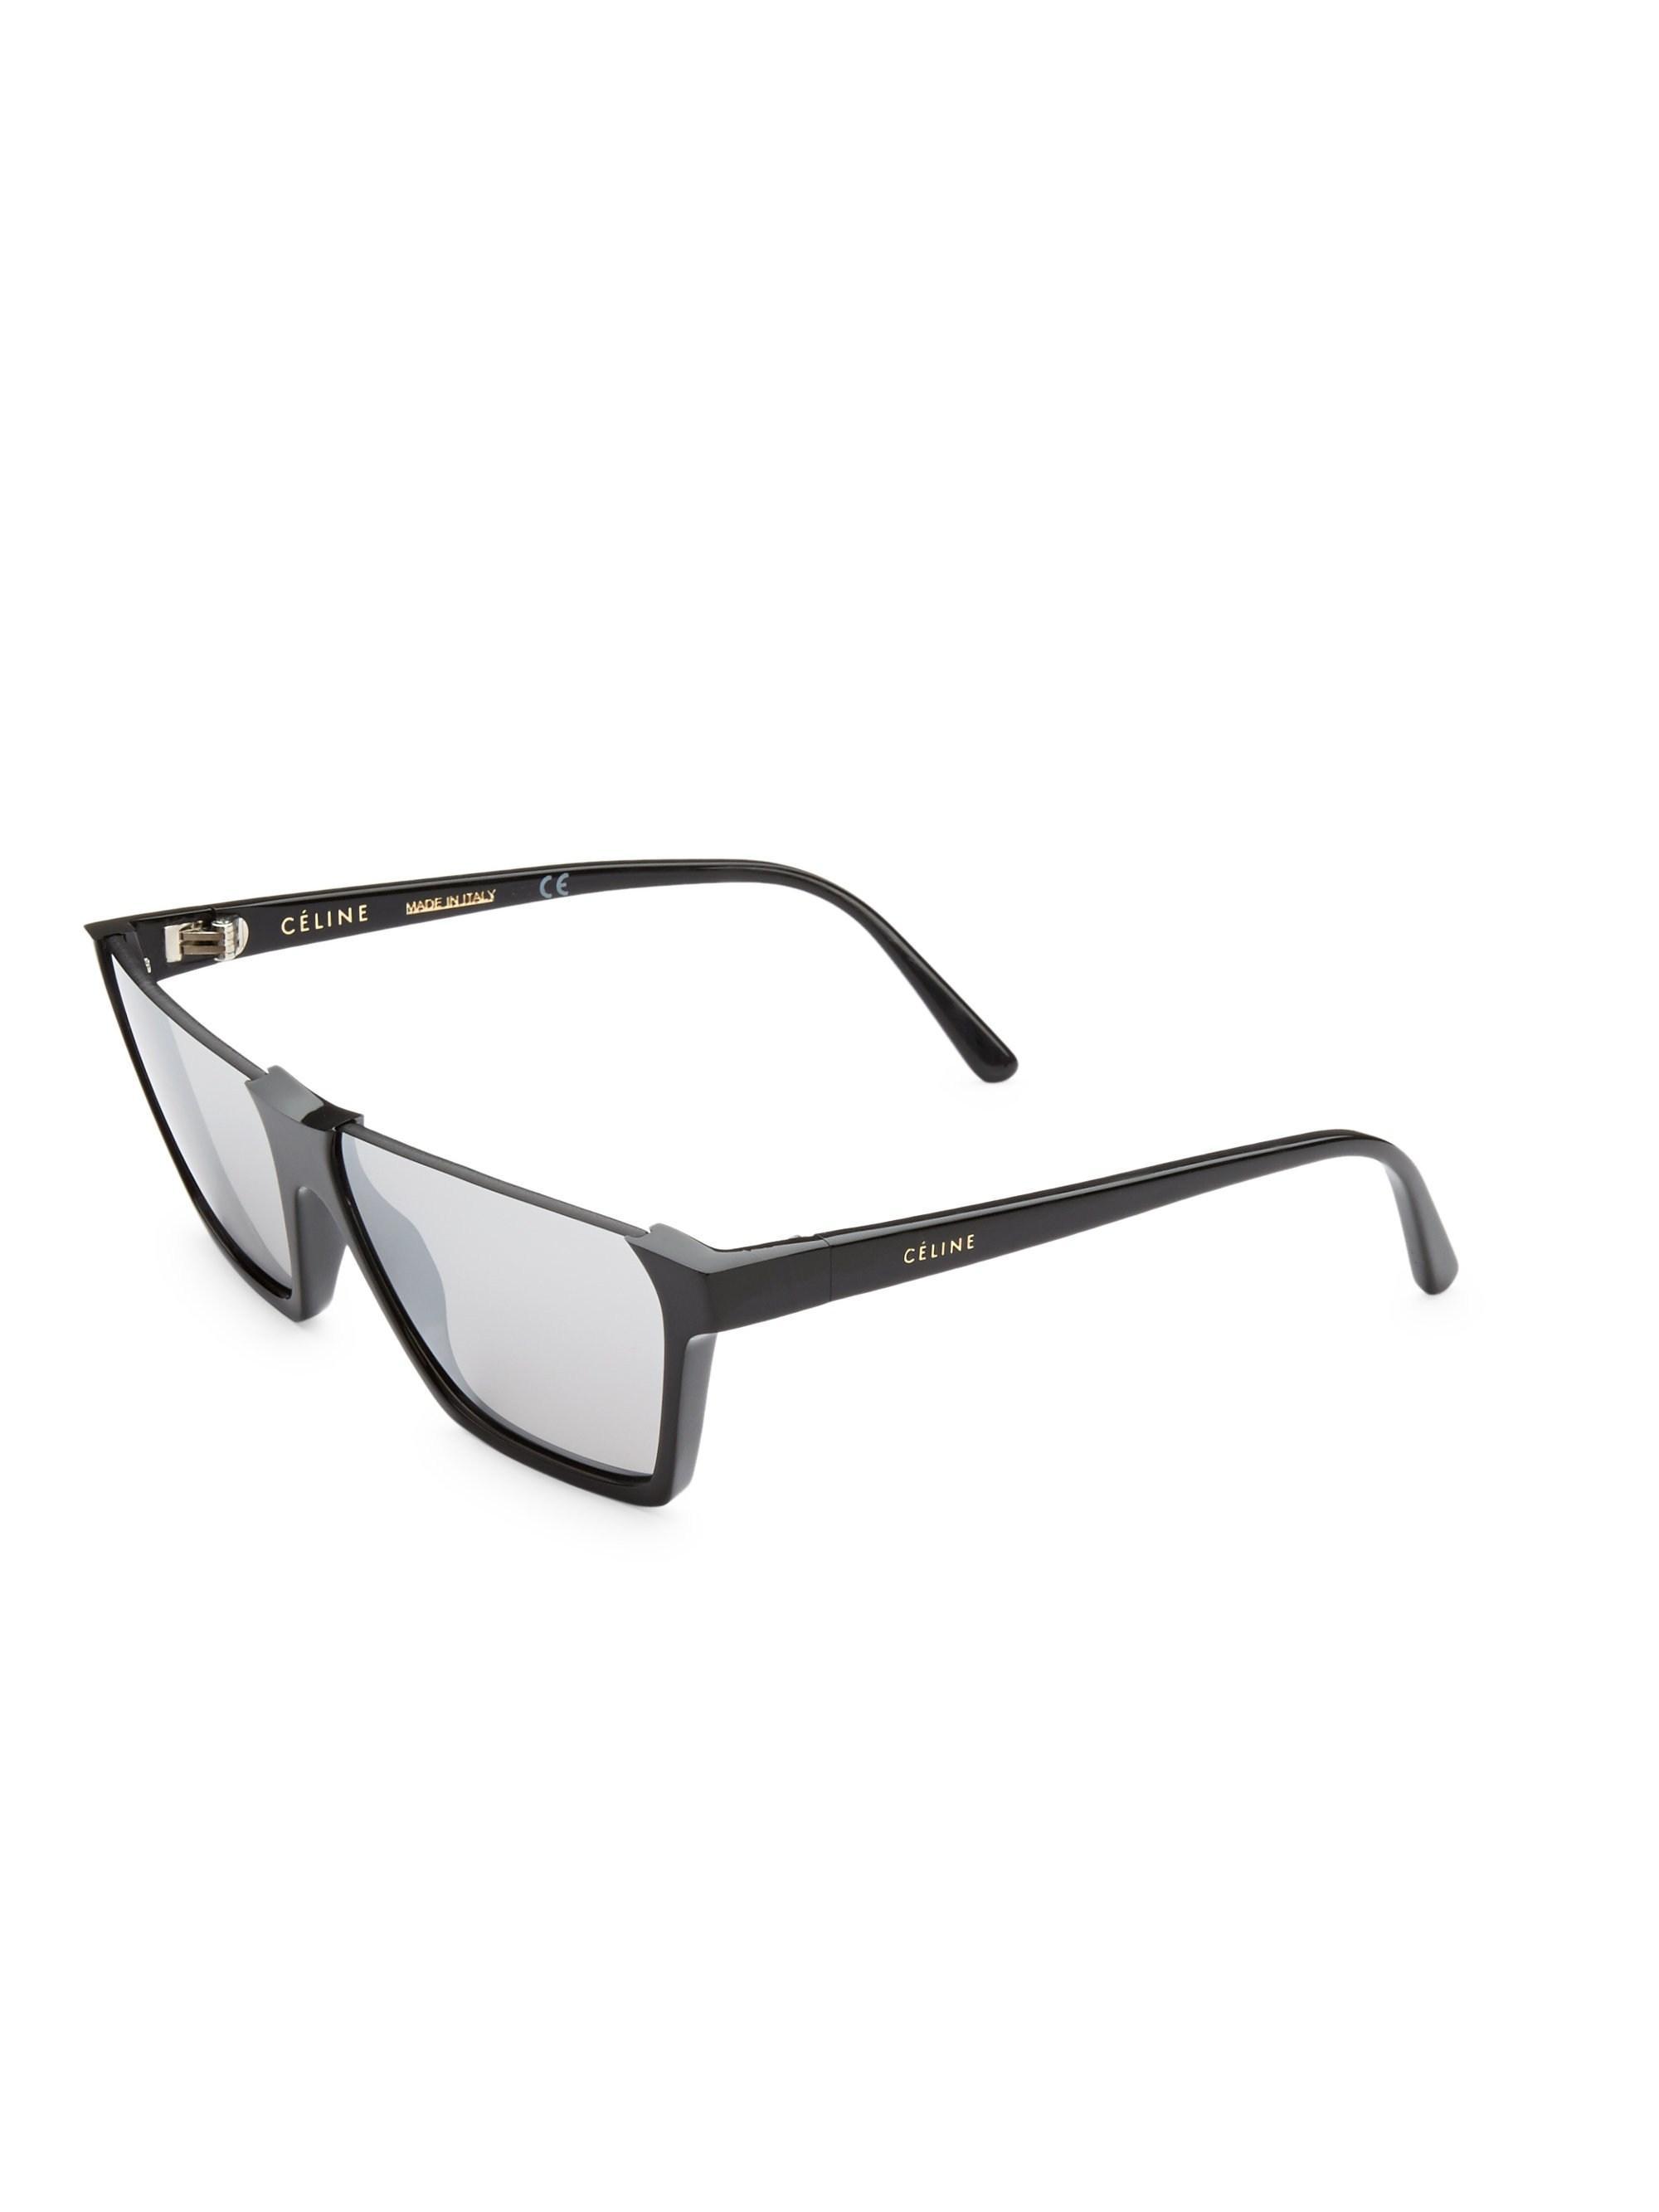 531917e6ad1 Lyst - Céline Women s 60mm Semi-rimless Rectangular Sunglasses ...